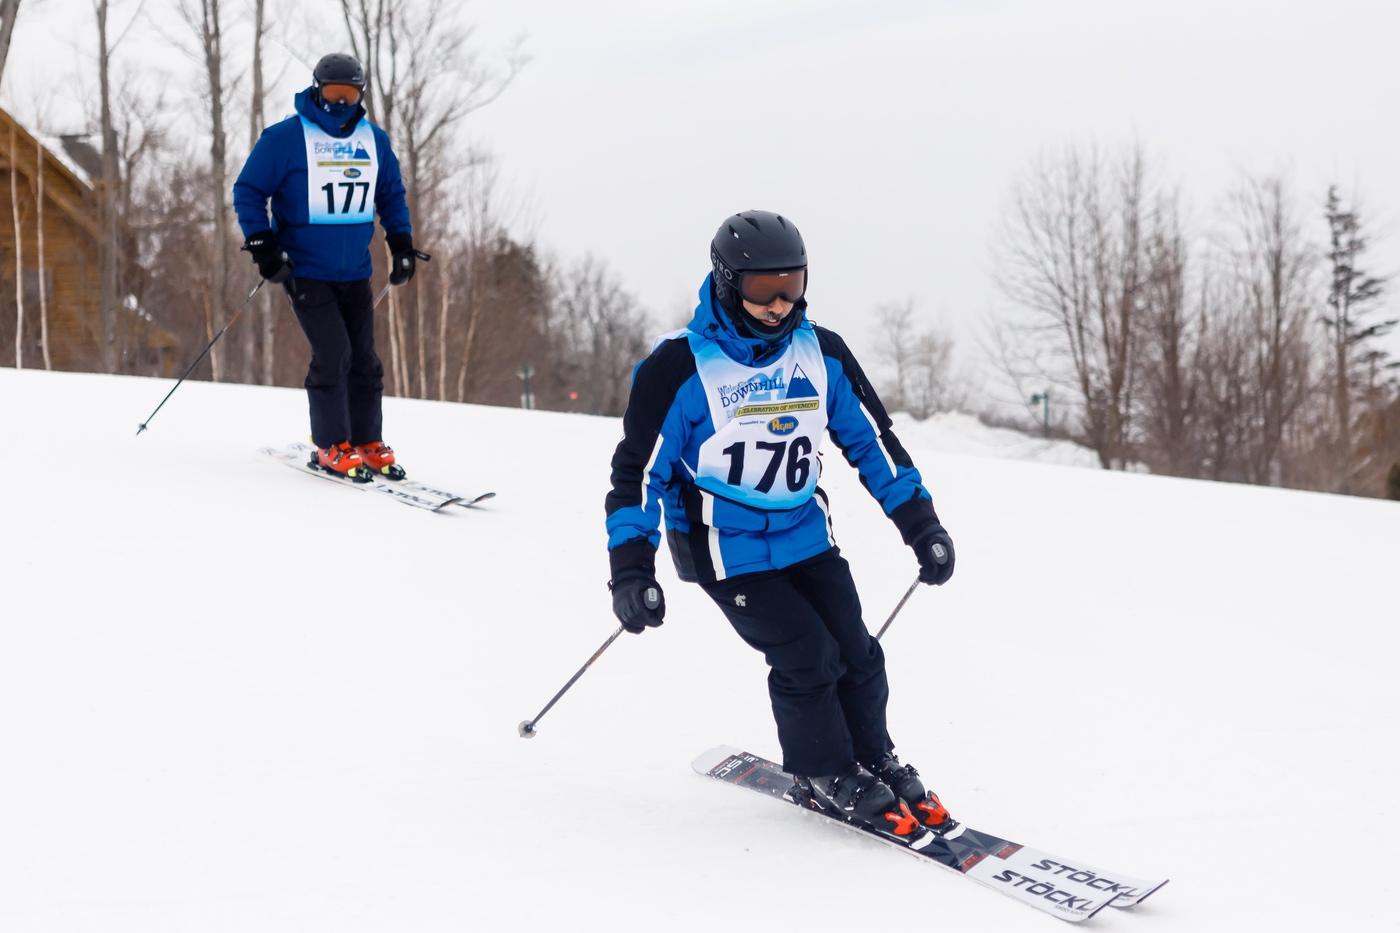 WinterKids Downhill 24 2021 SDP 2756